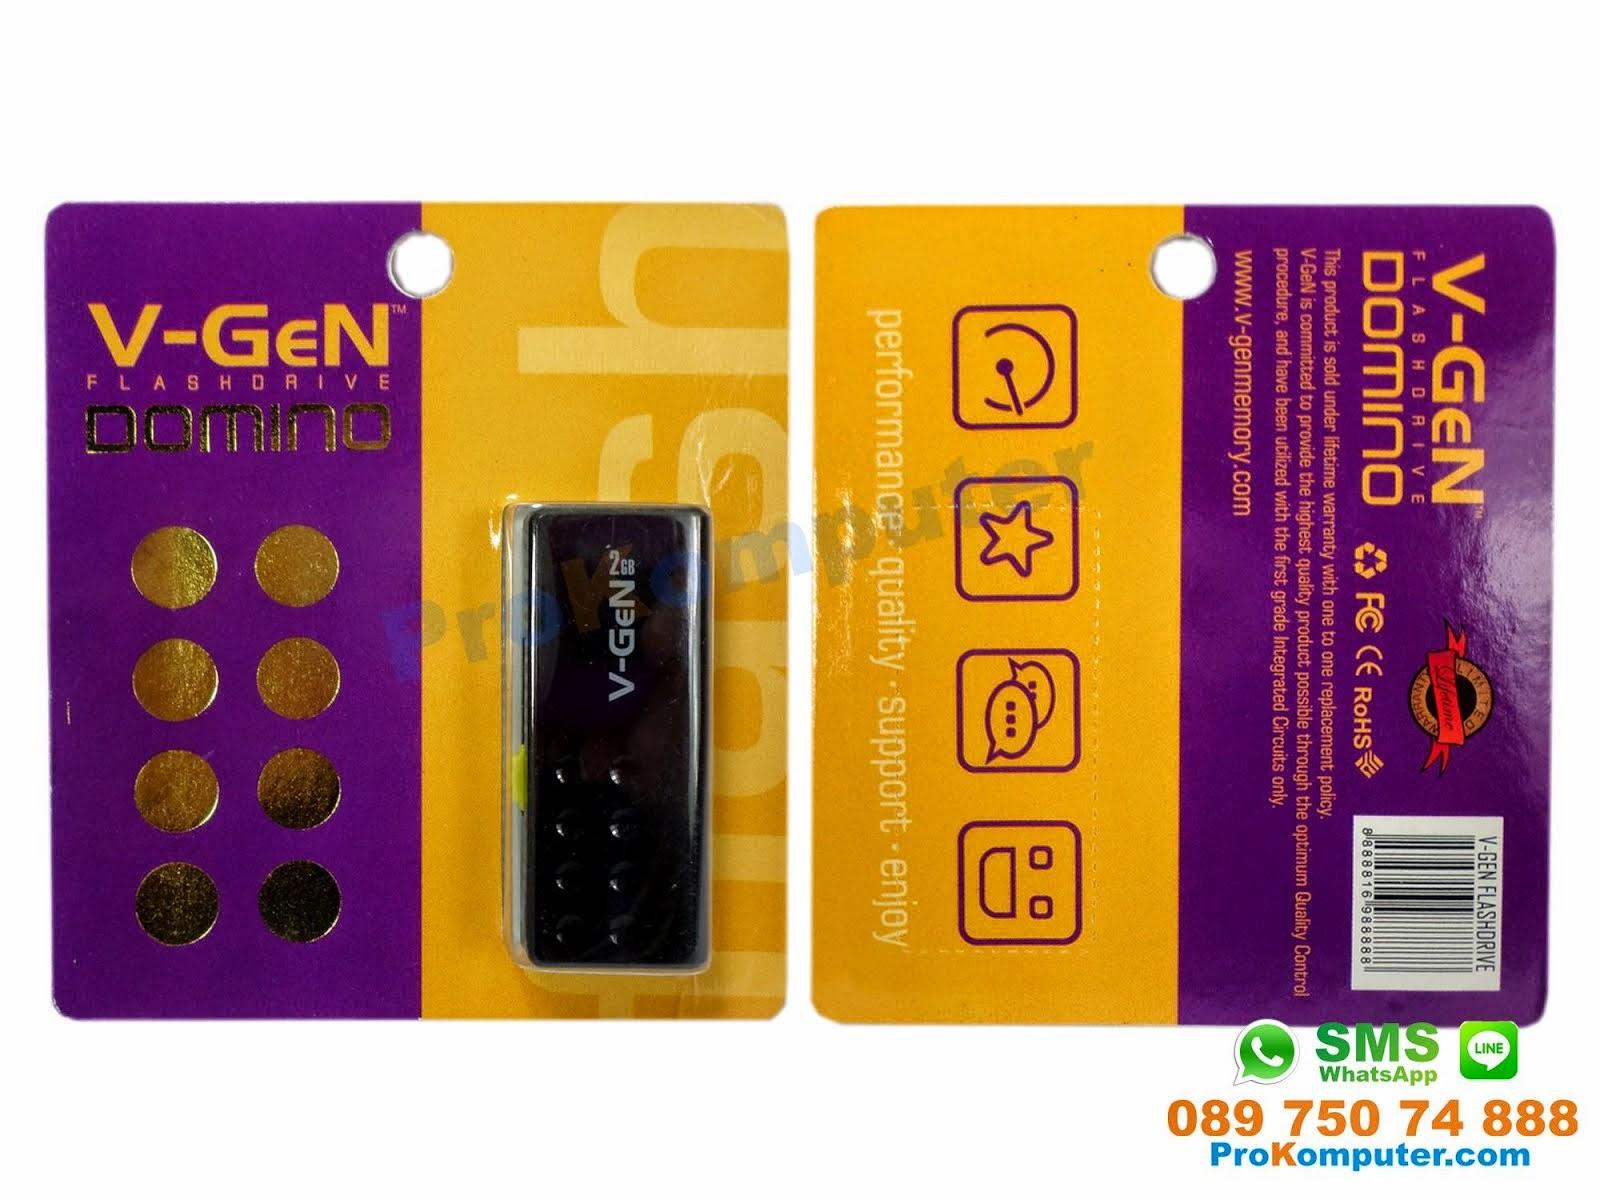 Prokomputer Flashdisk Vgen Usb Flash Drive Domino Black 2gb 2 Gb